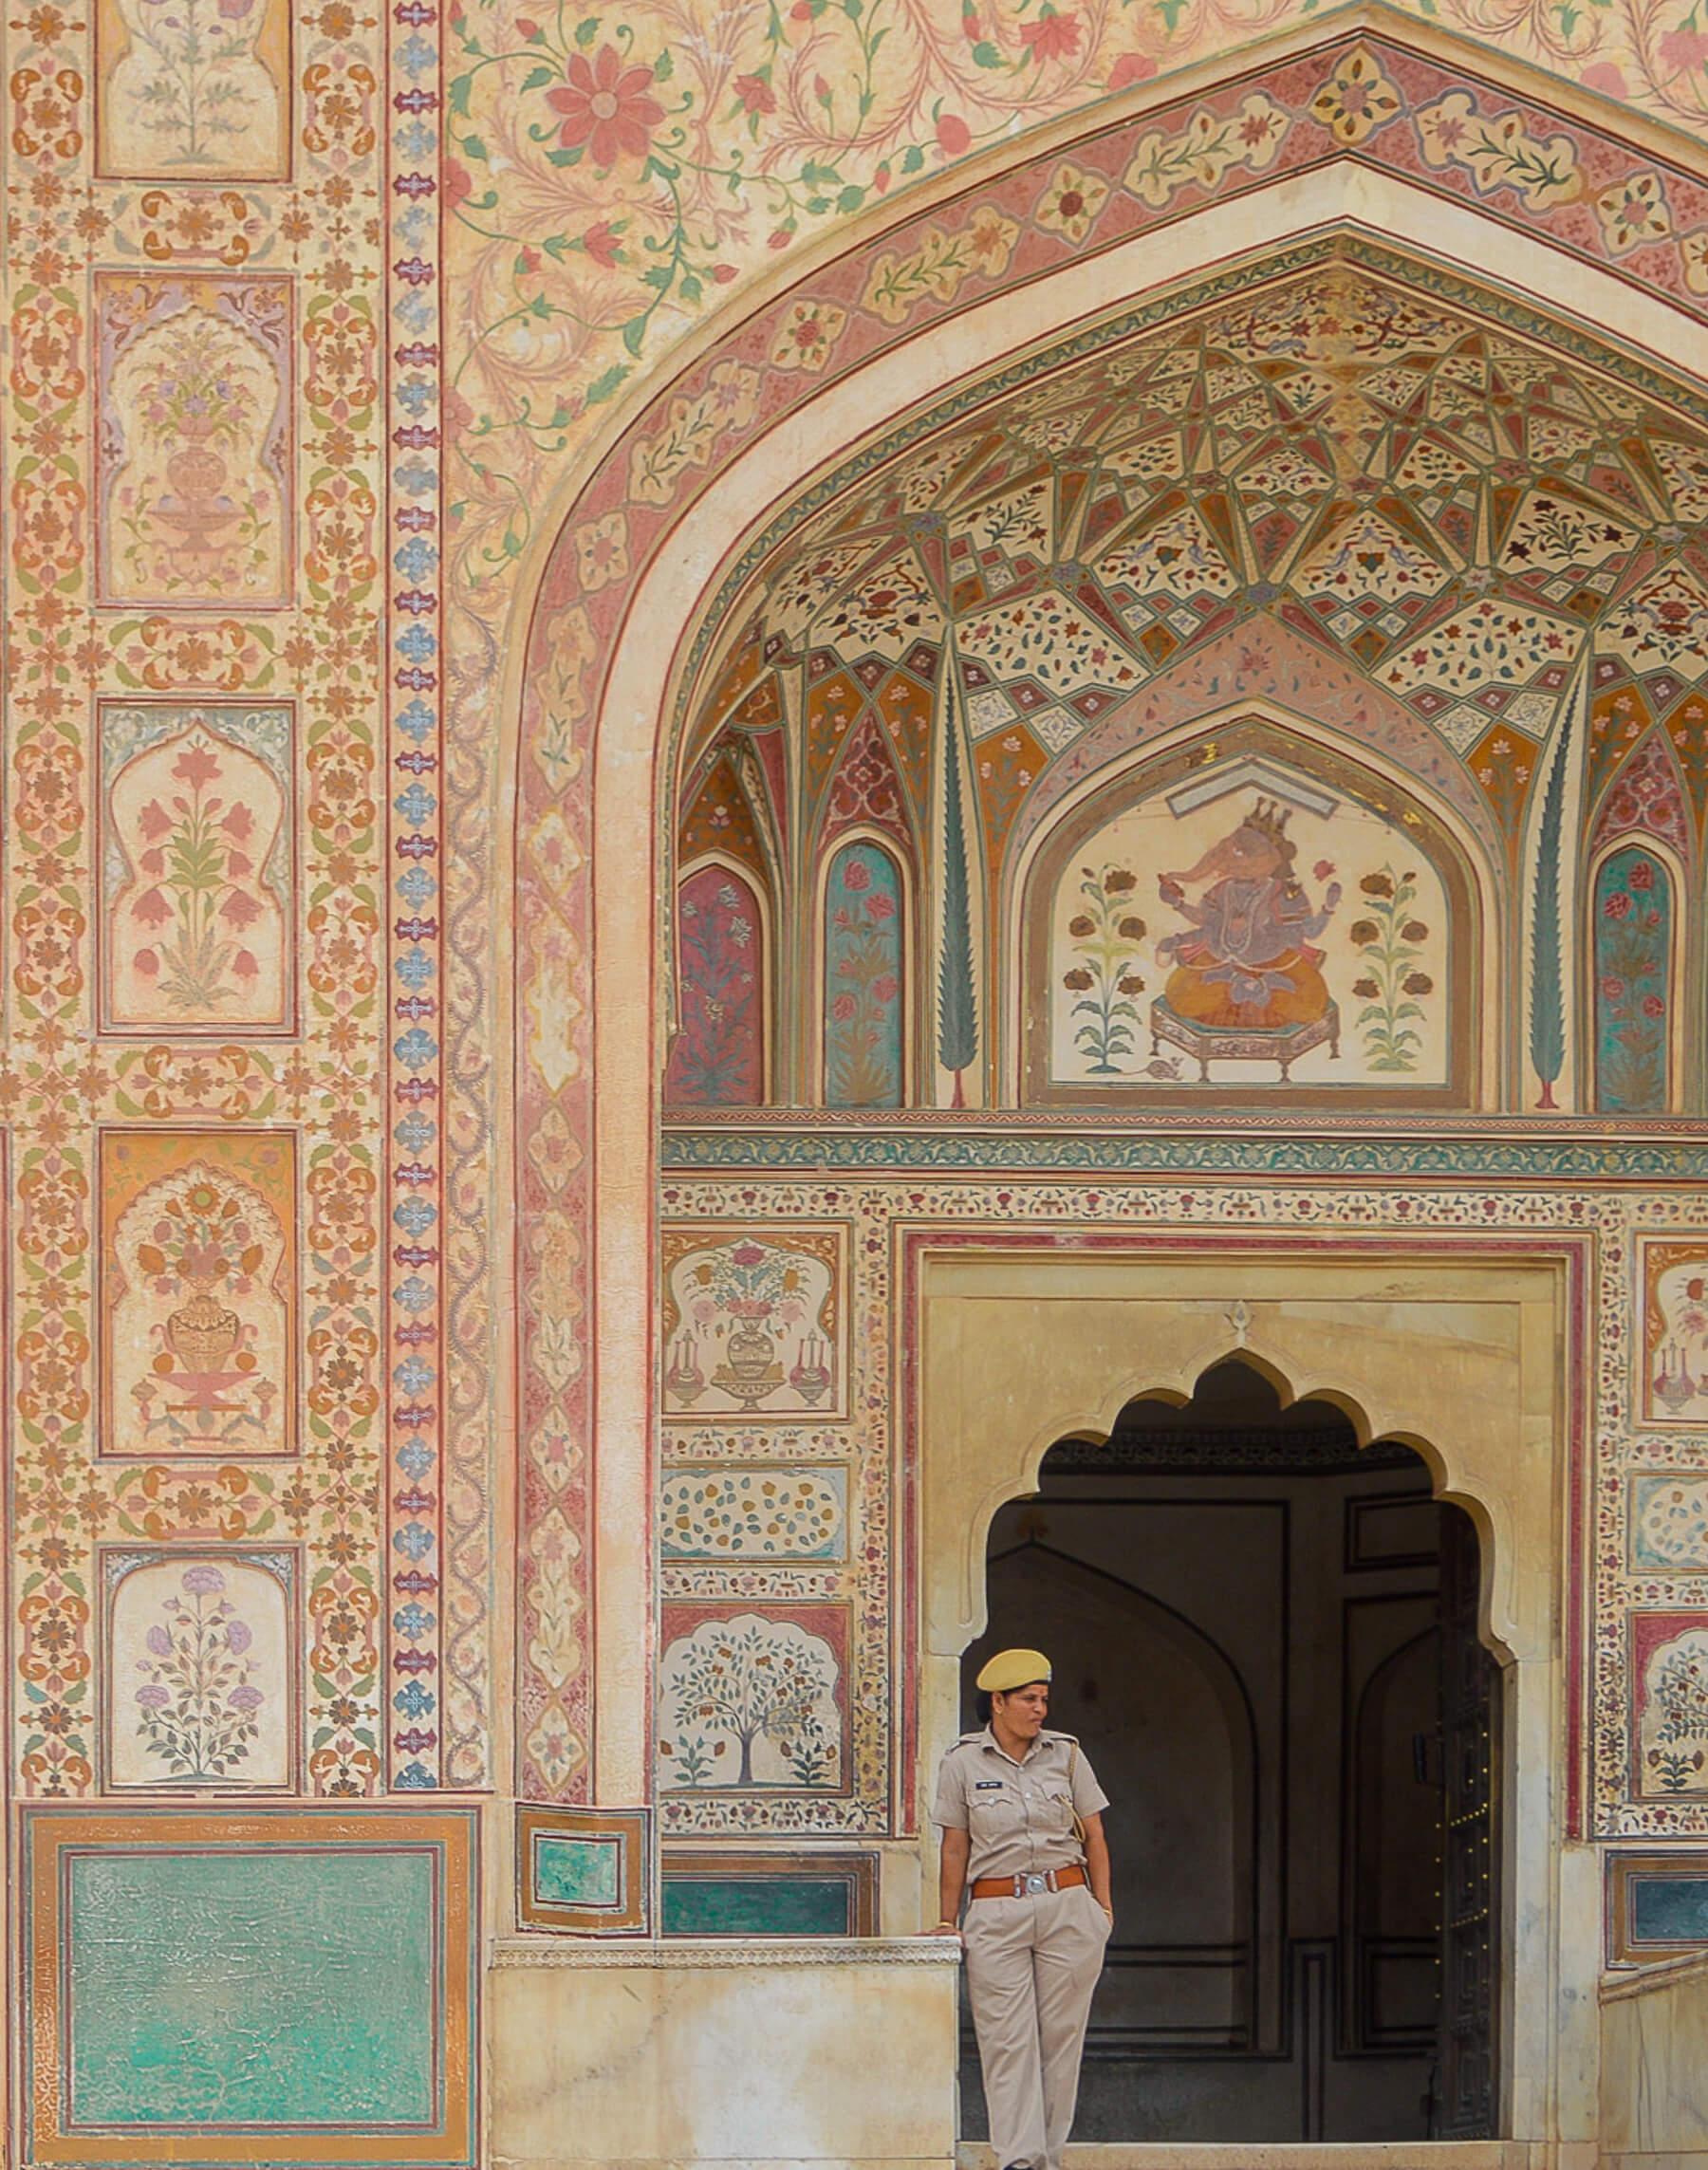 BEAUTIFUL INDIAN ARCHITECTURE: PHOTO DIARY